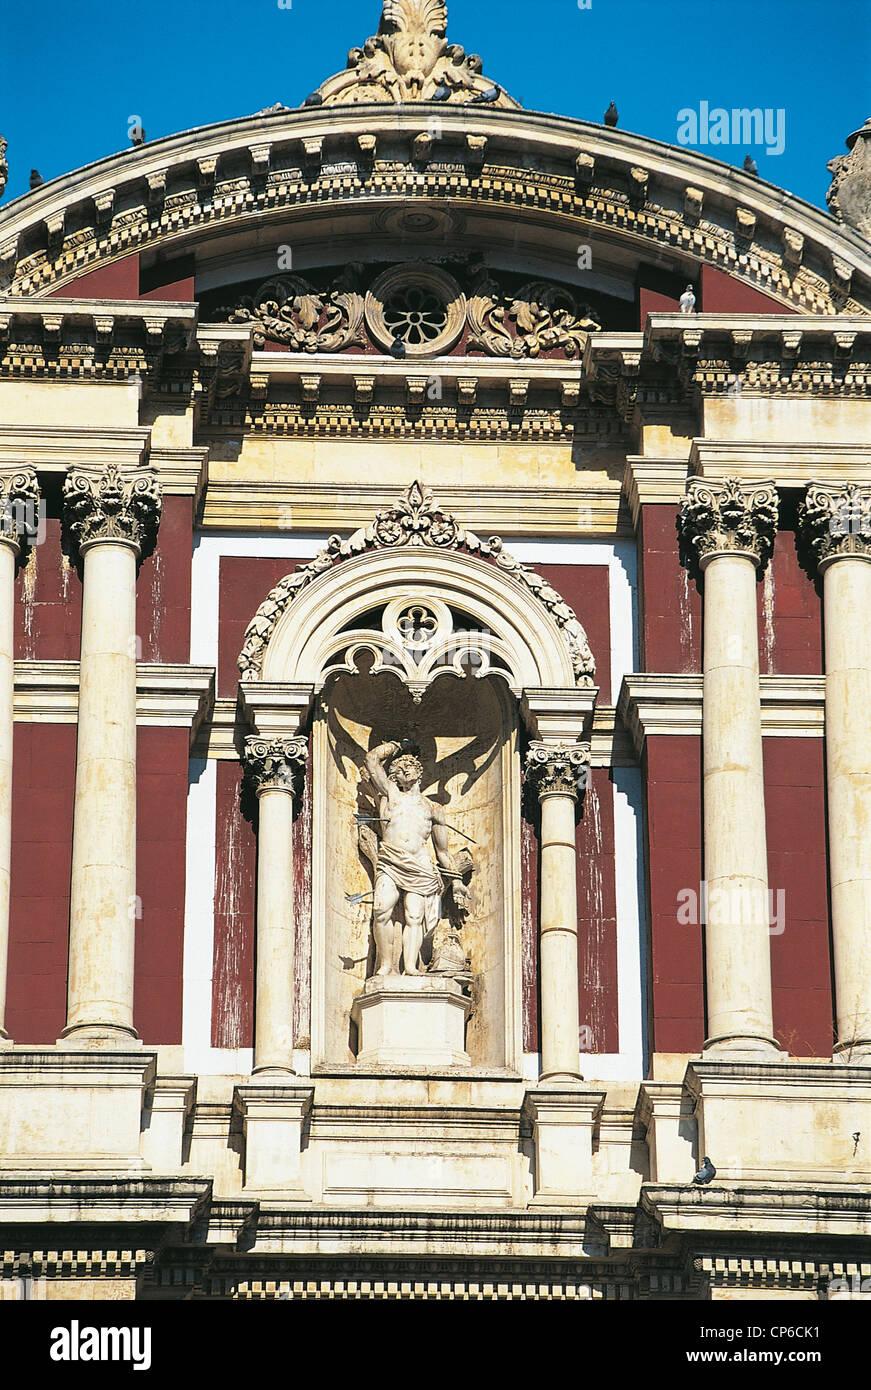 Sicily - Caltanissetta, particularly the Church of San Sebastiano. Stock Photo